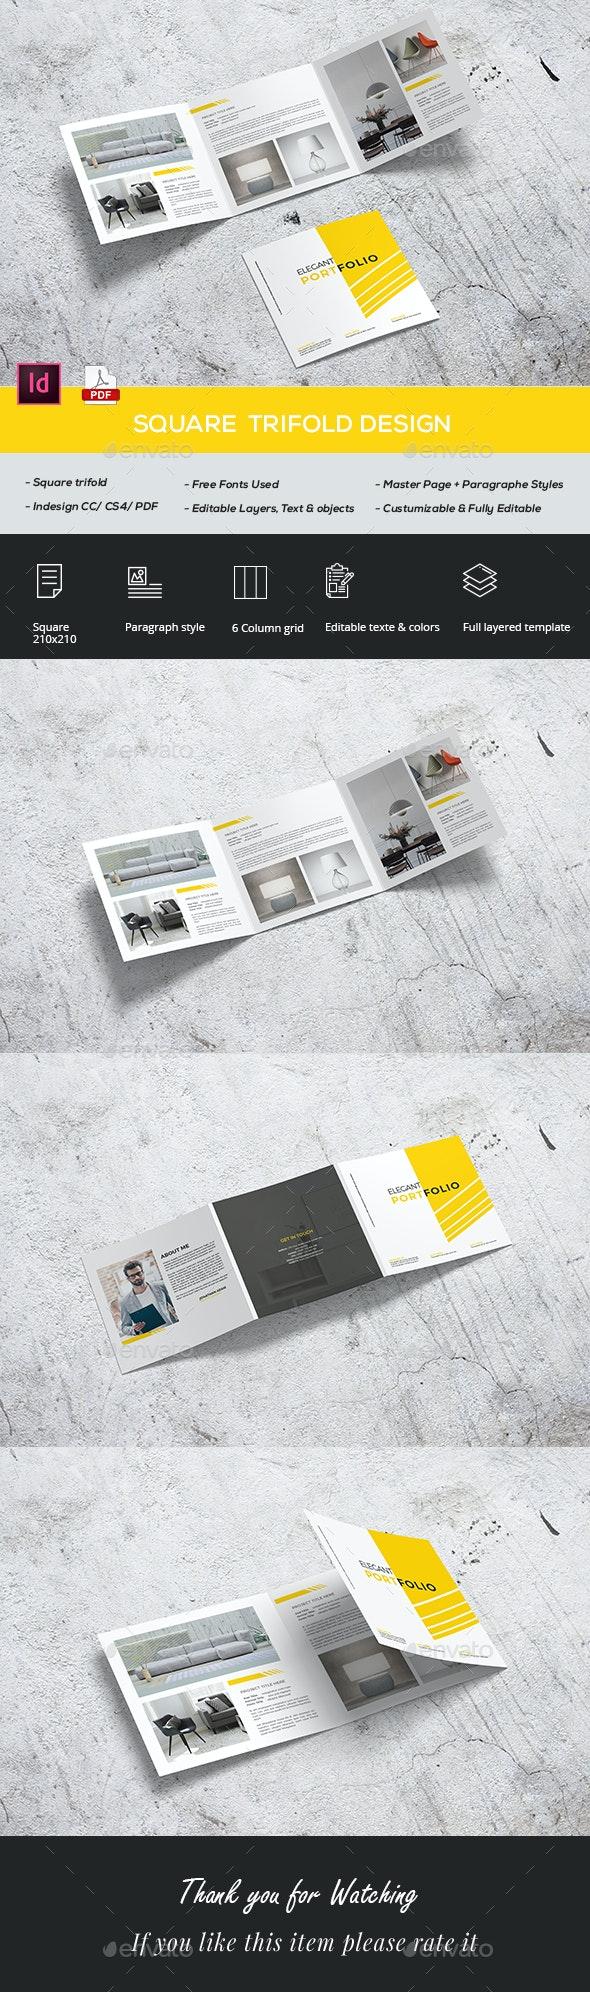 Square Trifold Portfolio - Portfolio Brochures